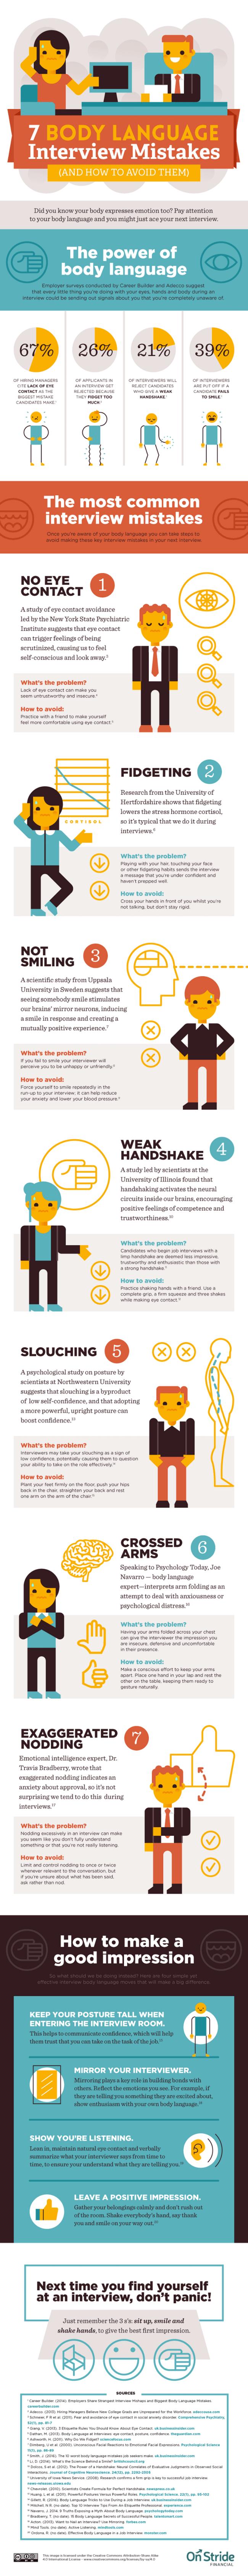 7 body language